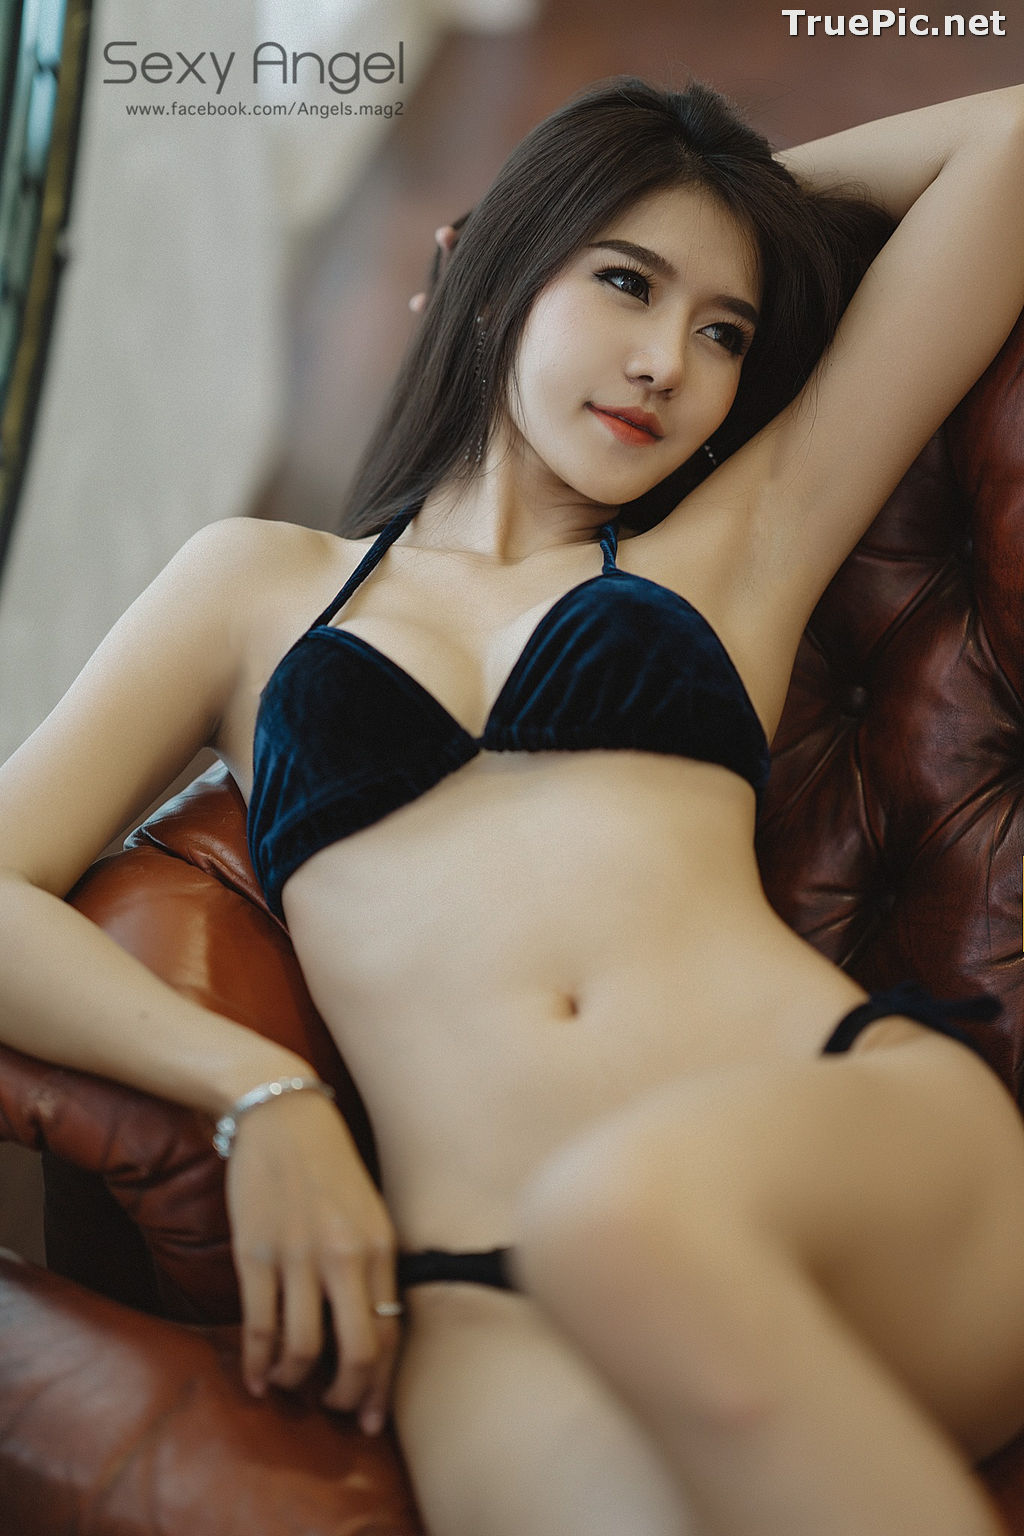 Image Thailand Model - Saruda Chalermsaen (EveAva) - Sexy Bikini Angel - TruePic.net - Picture-7